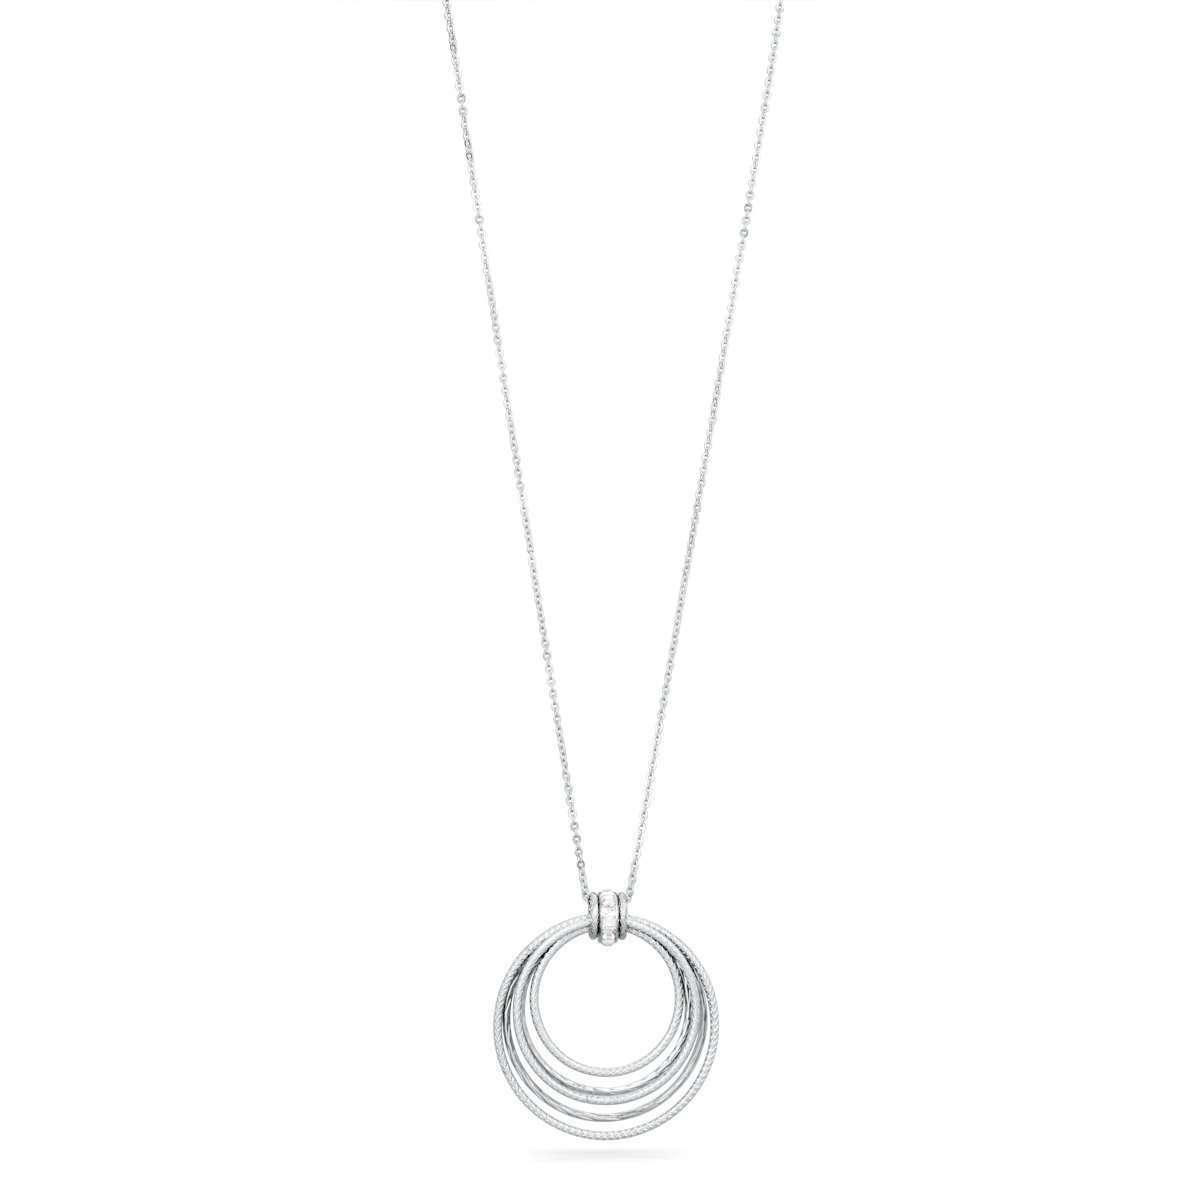 Brosway collana da donna in acciaio Falling Star